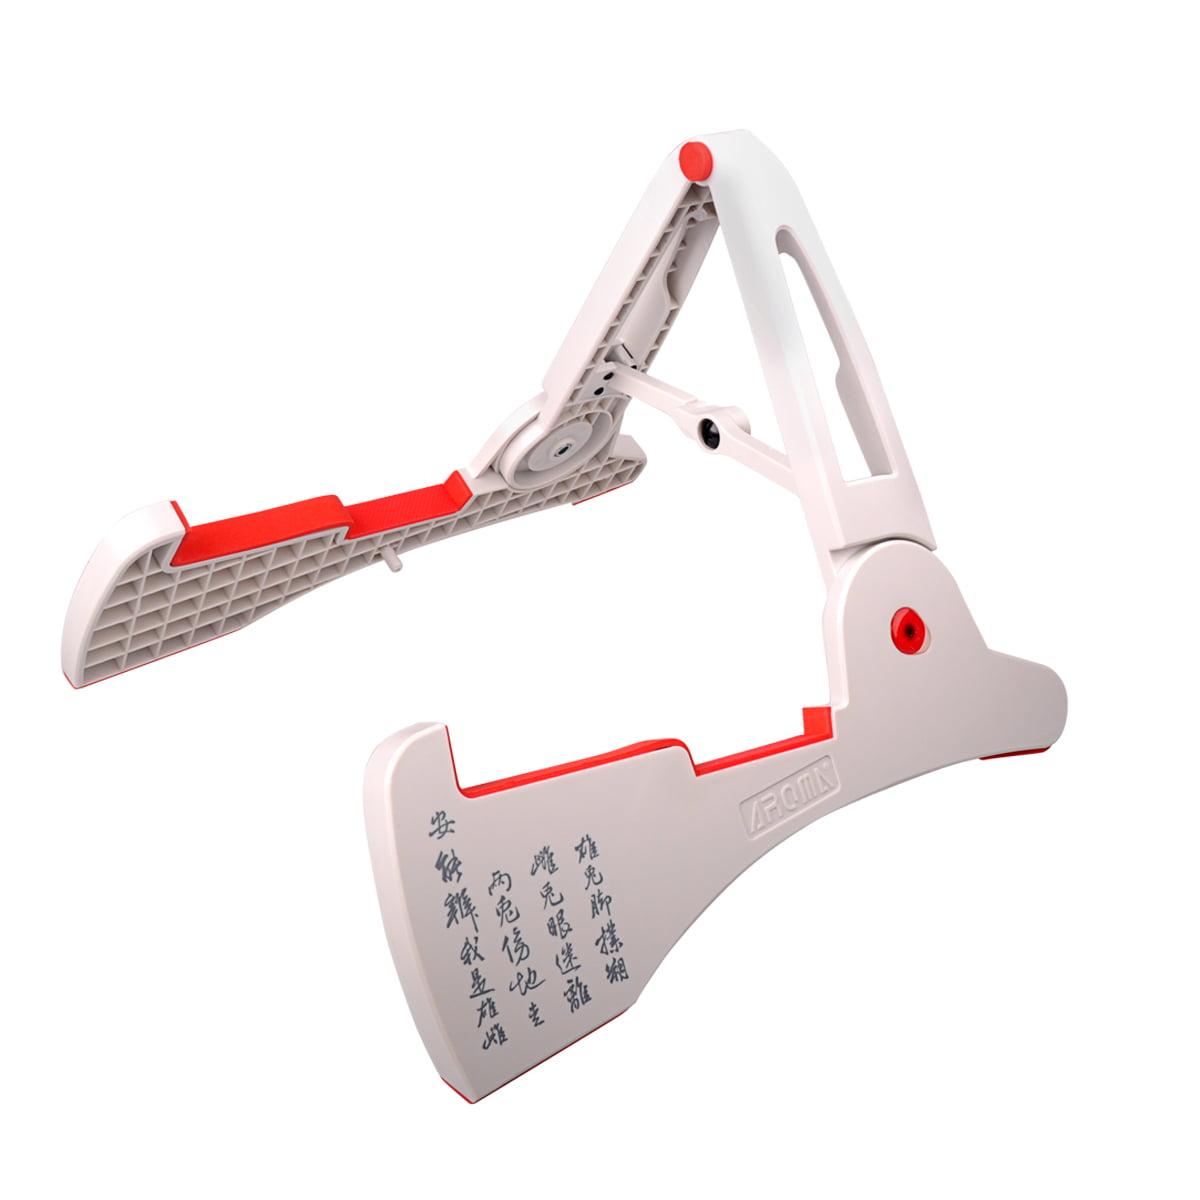 Guitar Ukulele Violin Mandolin Stand Frame Rack Portable Adjustable Collapsible For Pro... by LC Prime